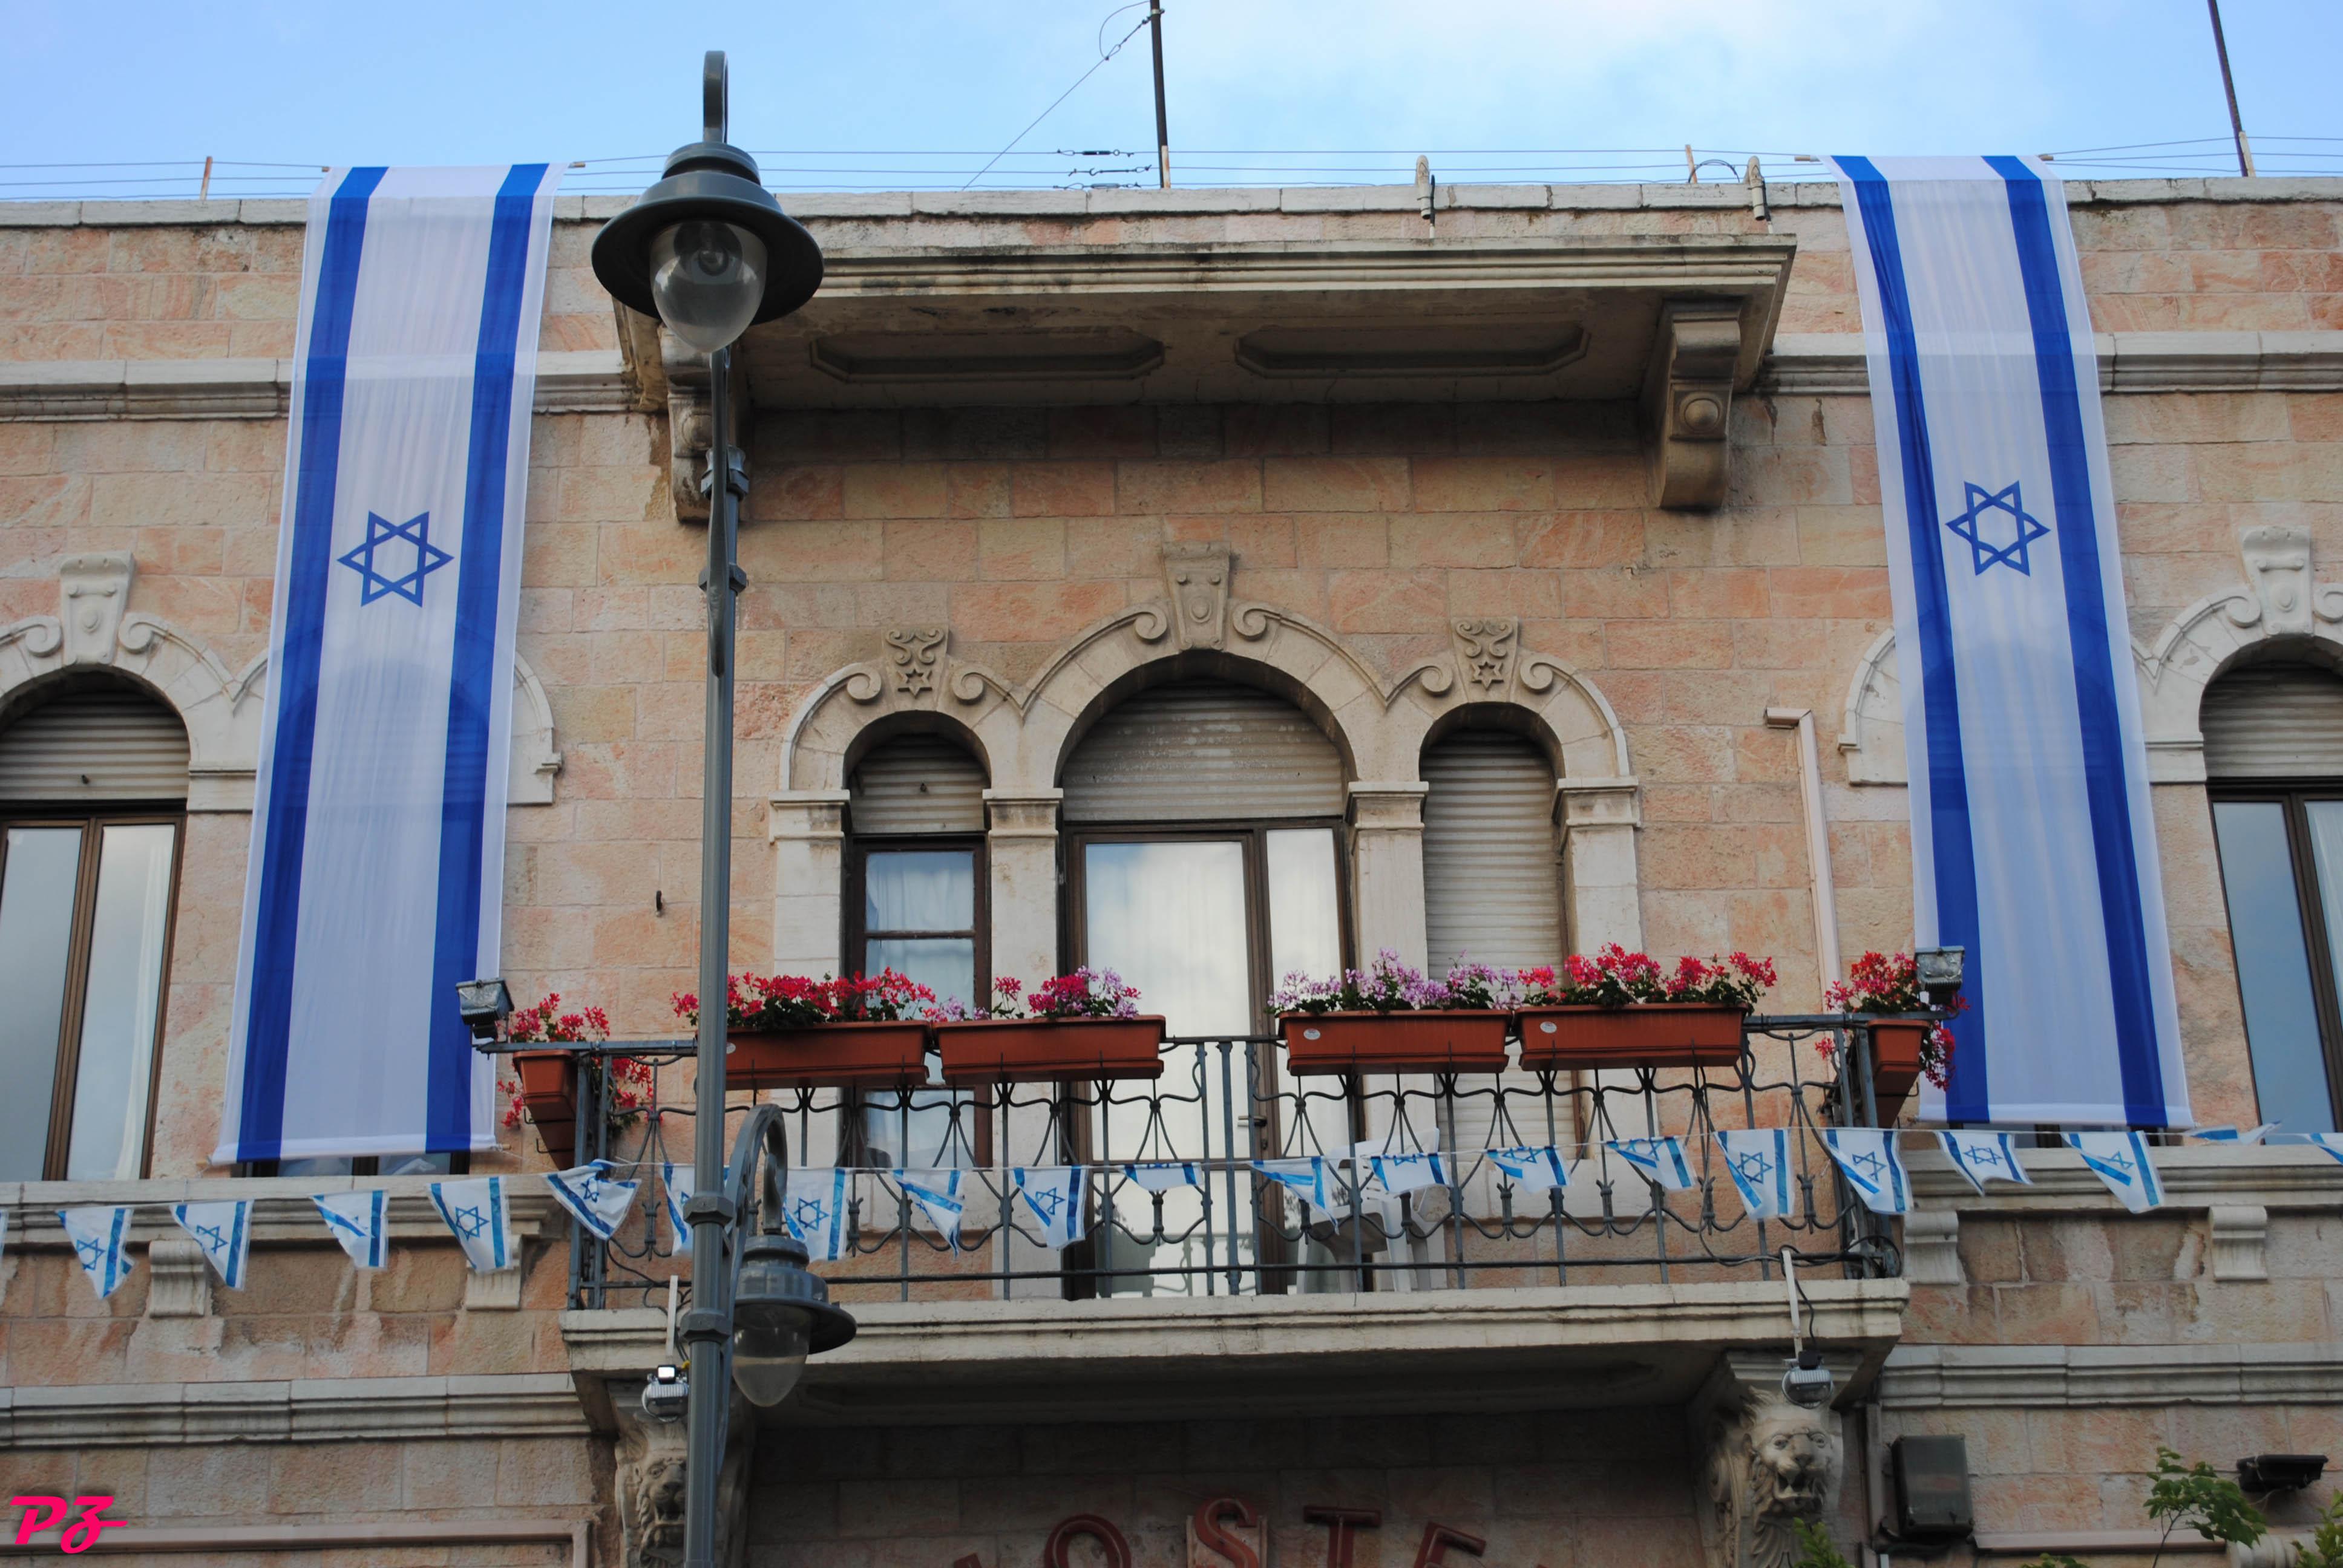 Judíos y árabes dicen estar orgullosos de ser israelíes